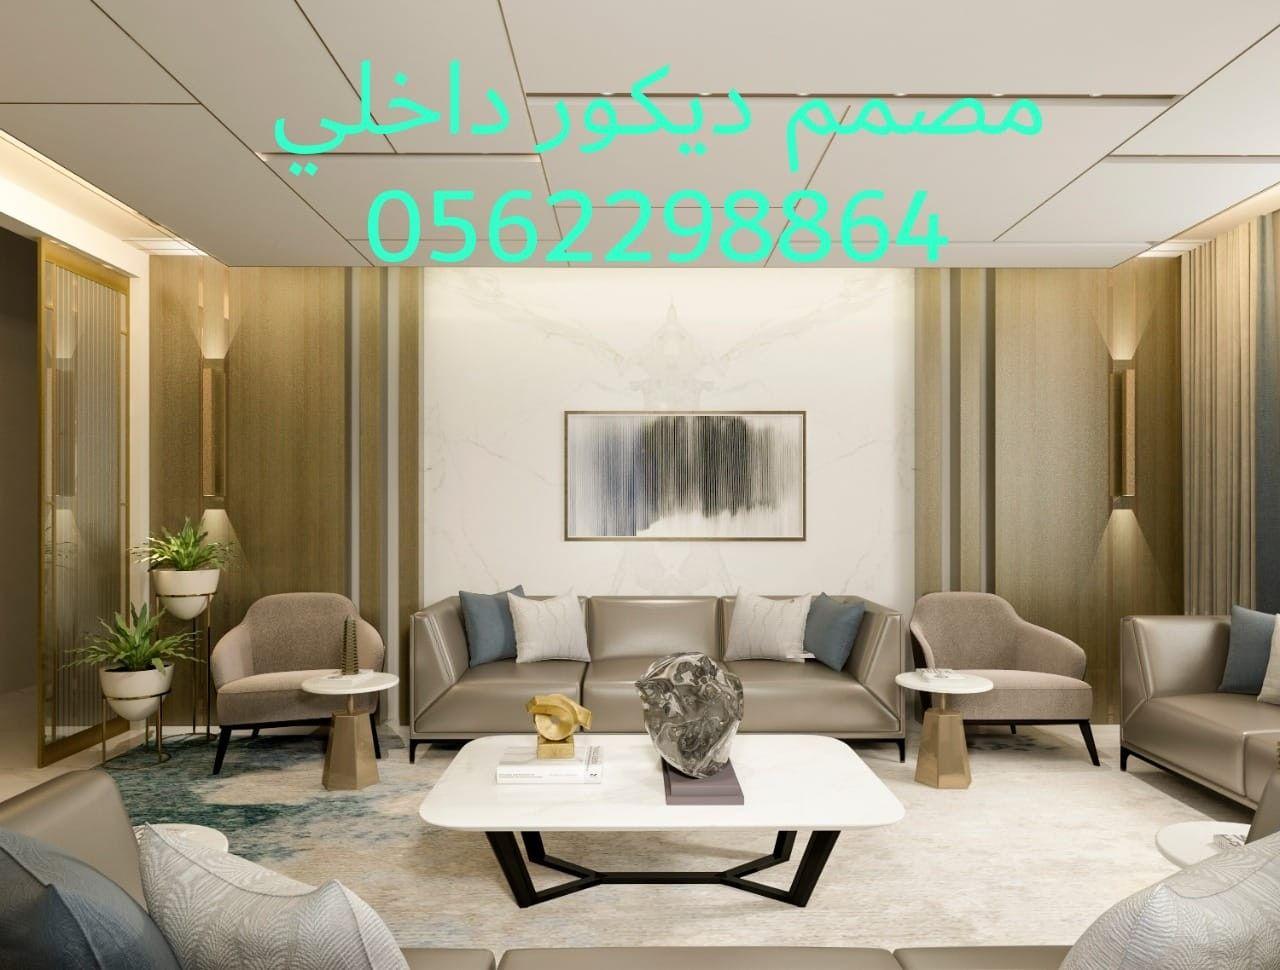 مهندس ديكور في الرياض مهندس تصاميم قصور في الرياض احدث تصاميم ثلاثيه الابعاد مصمم داخلي في الرياض مهندس تصميم ديكورات Home Decor Decals Home Decor Home